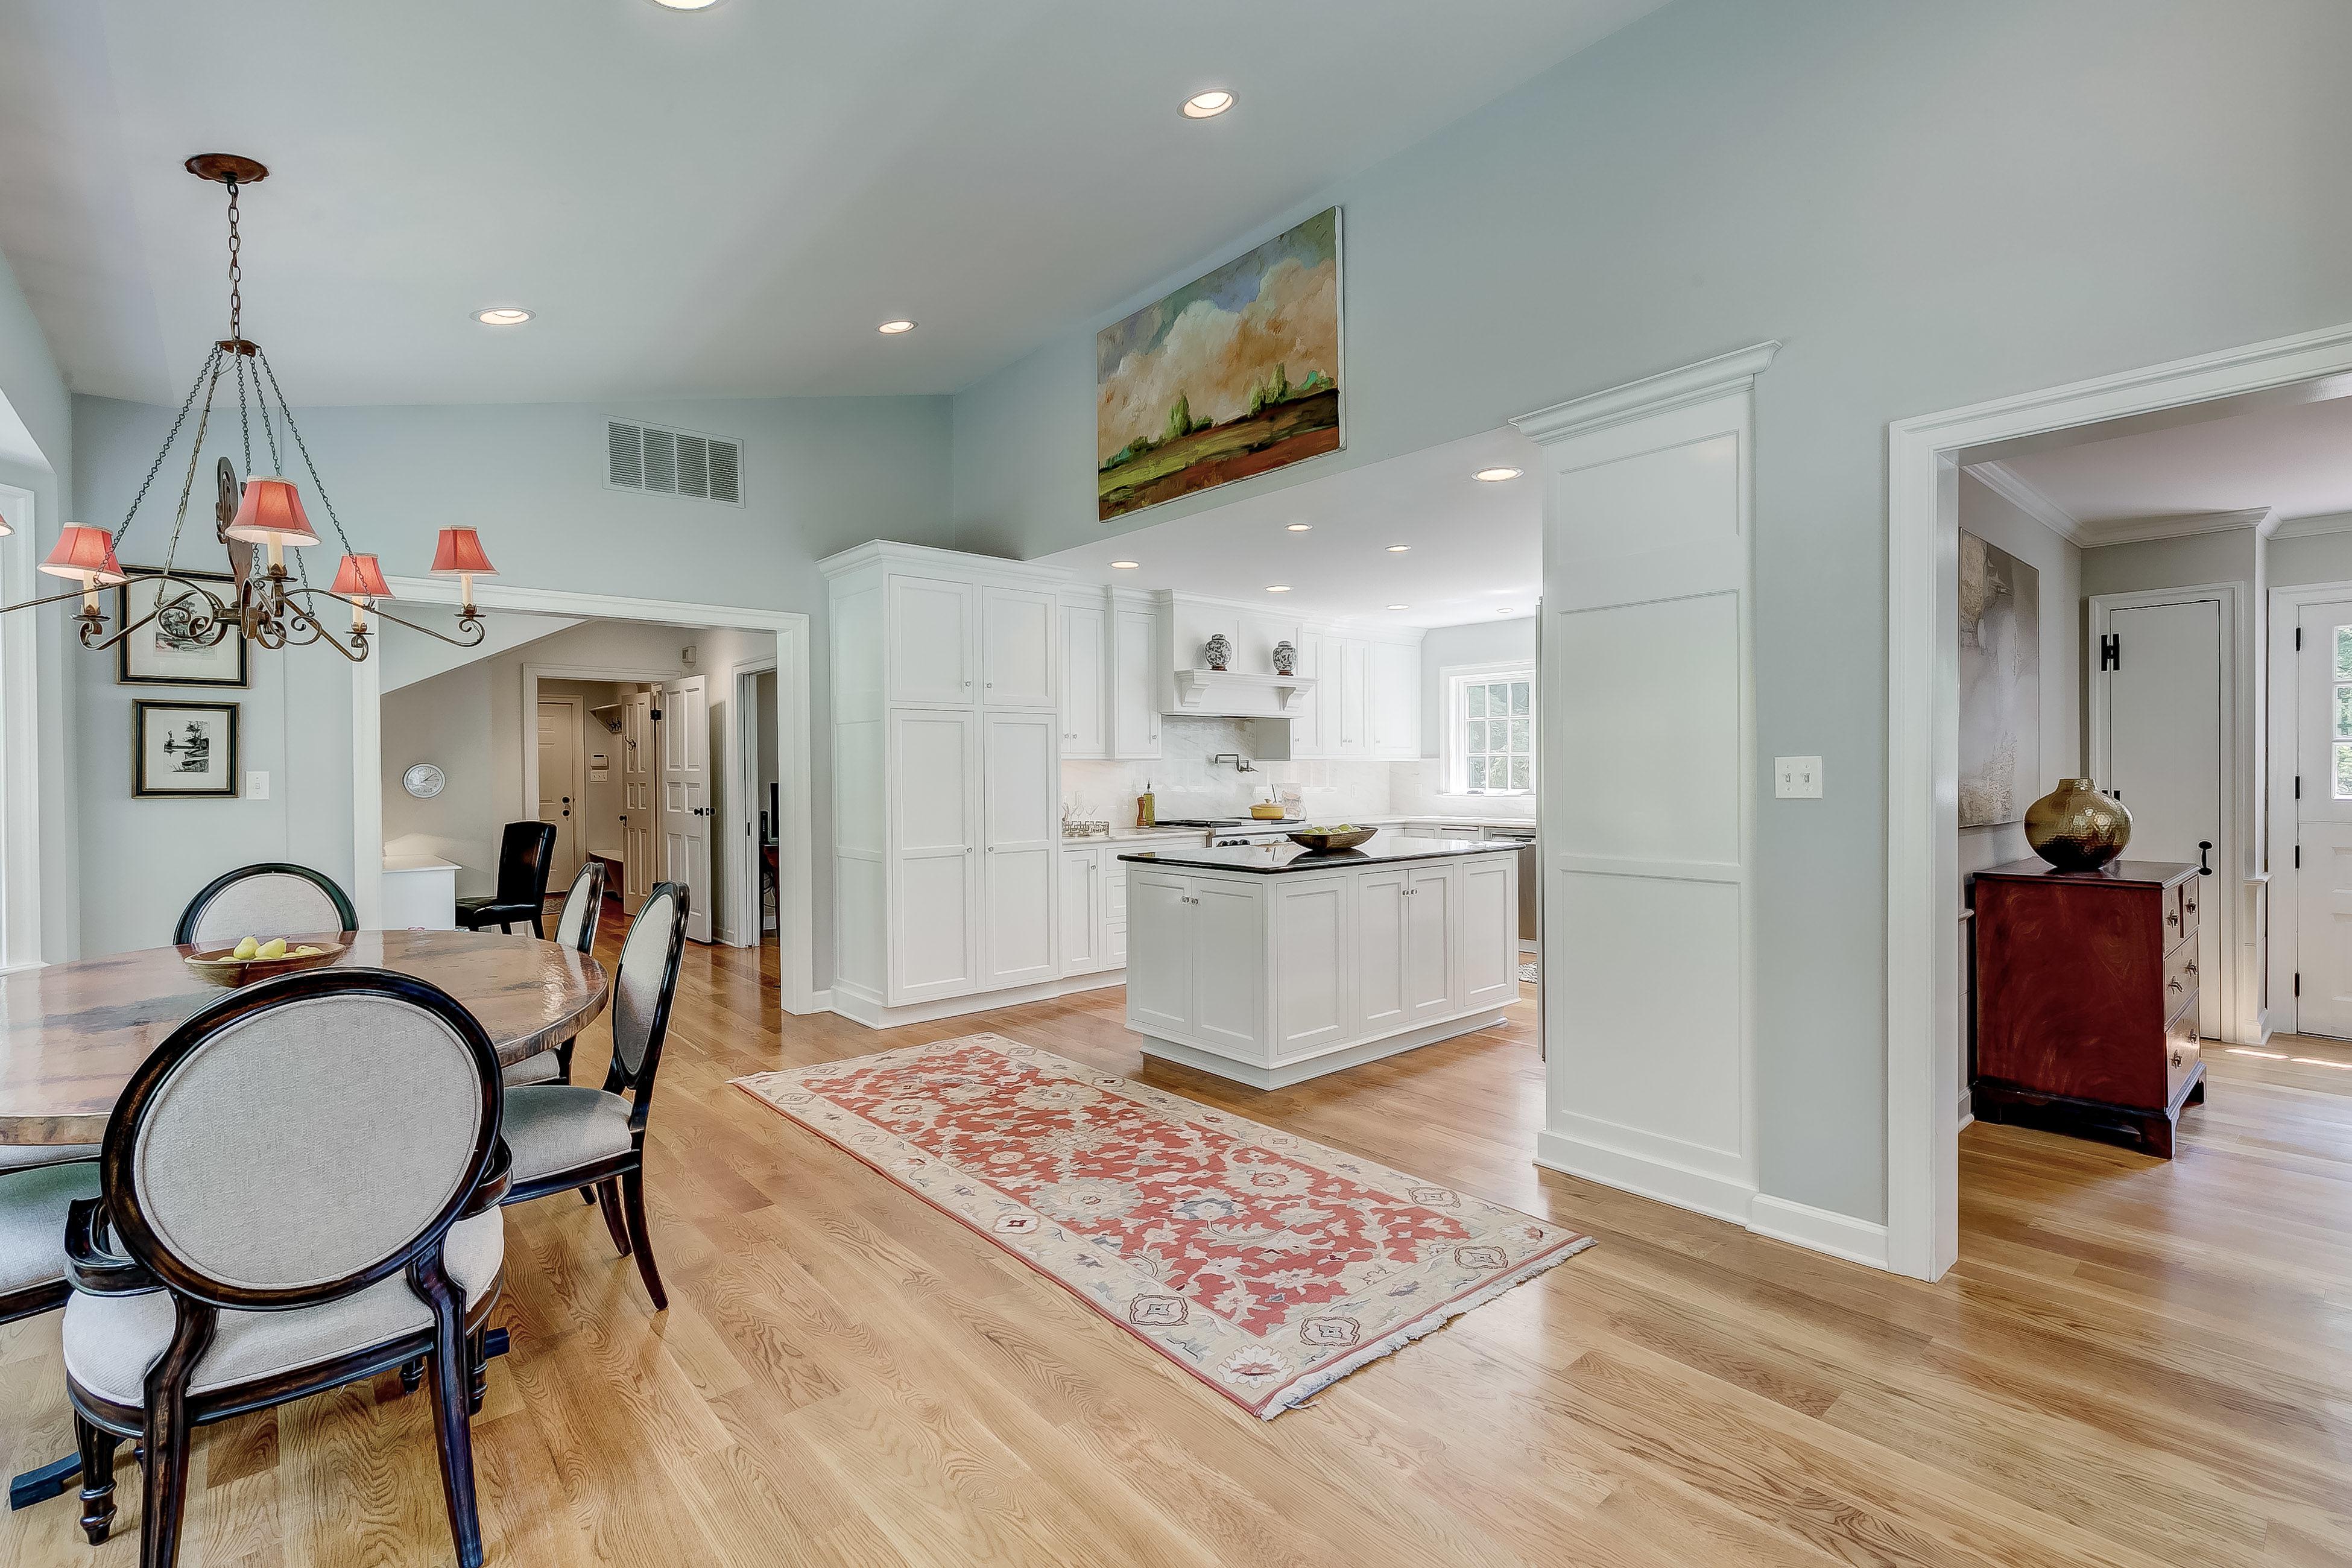 Kitchen and hall to garage